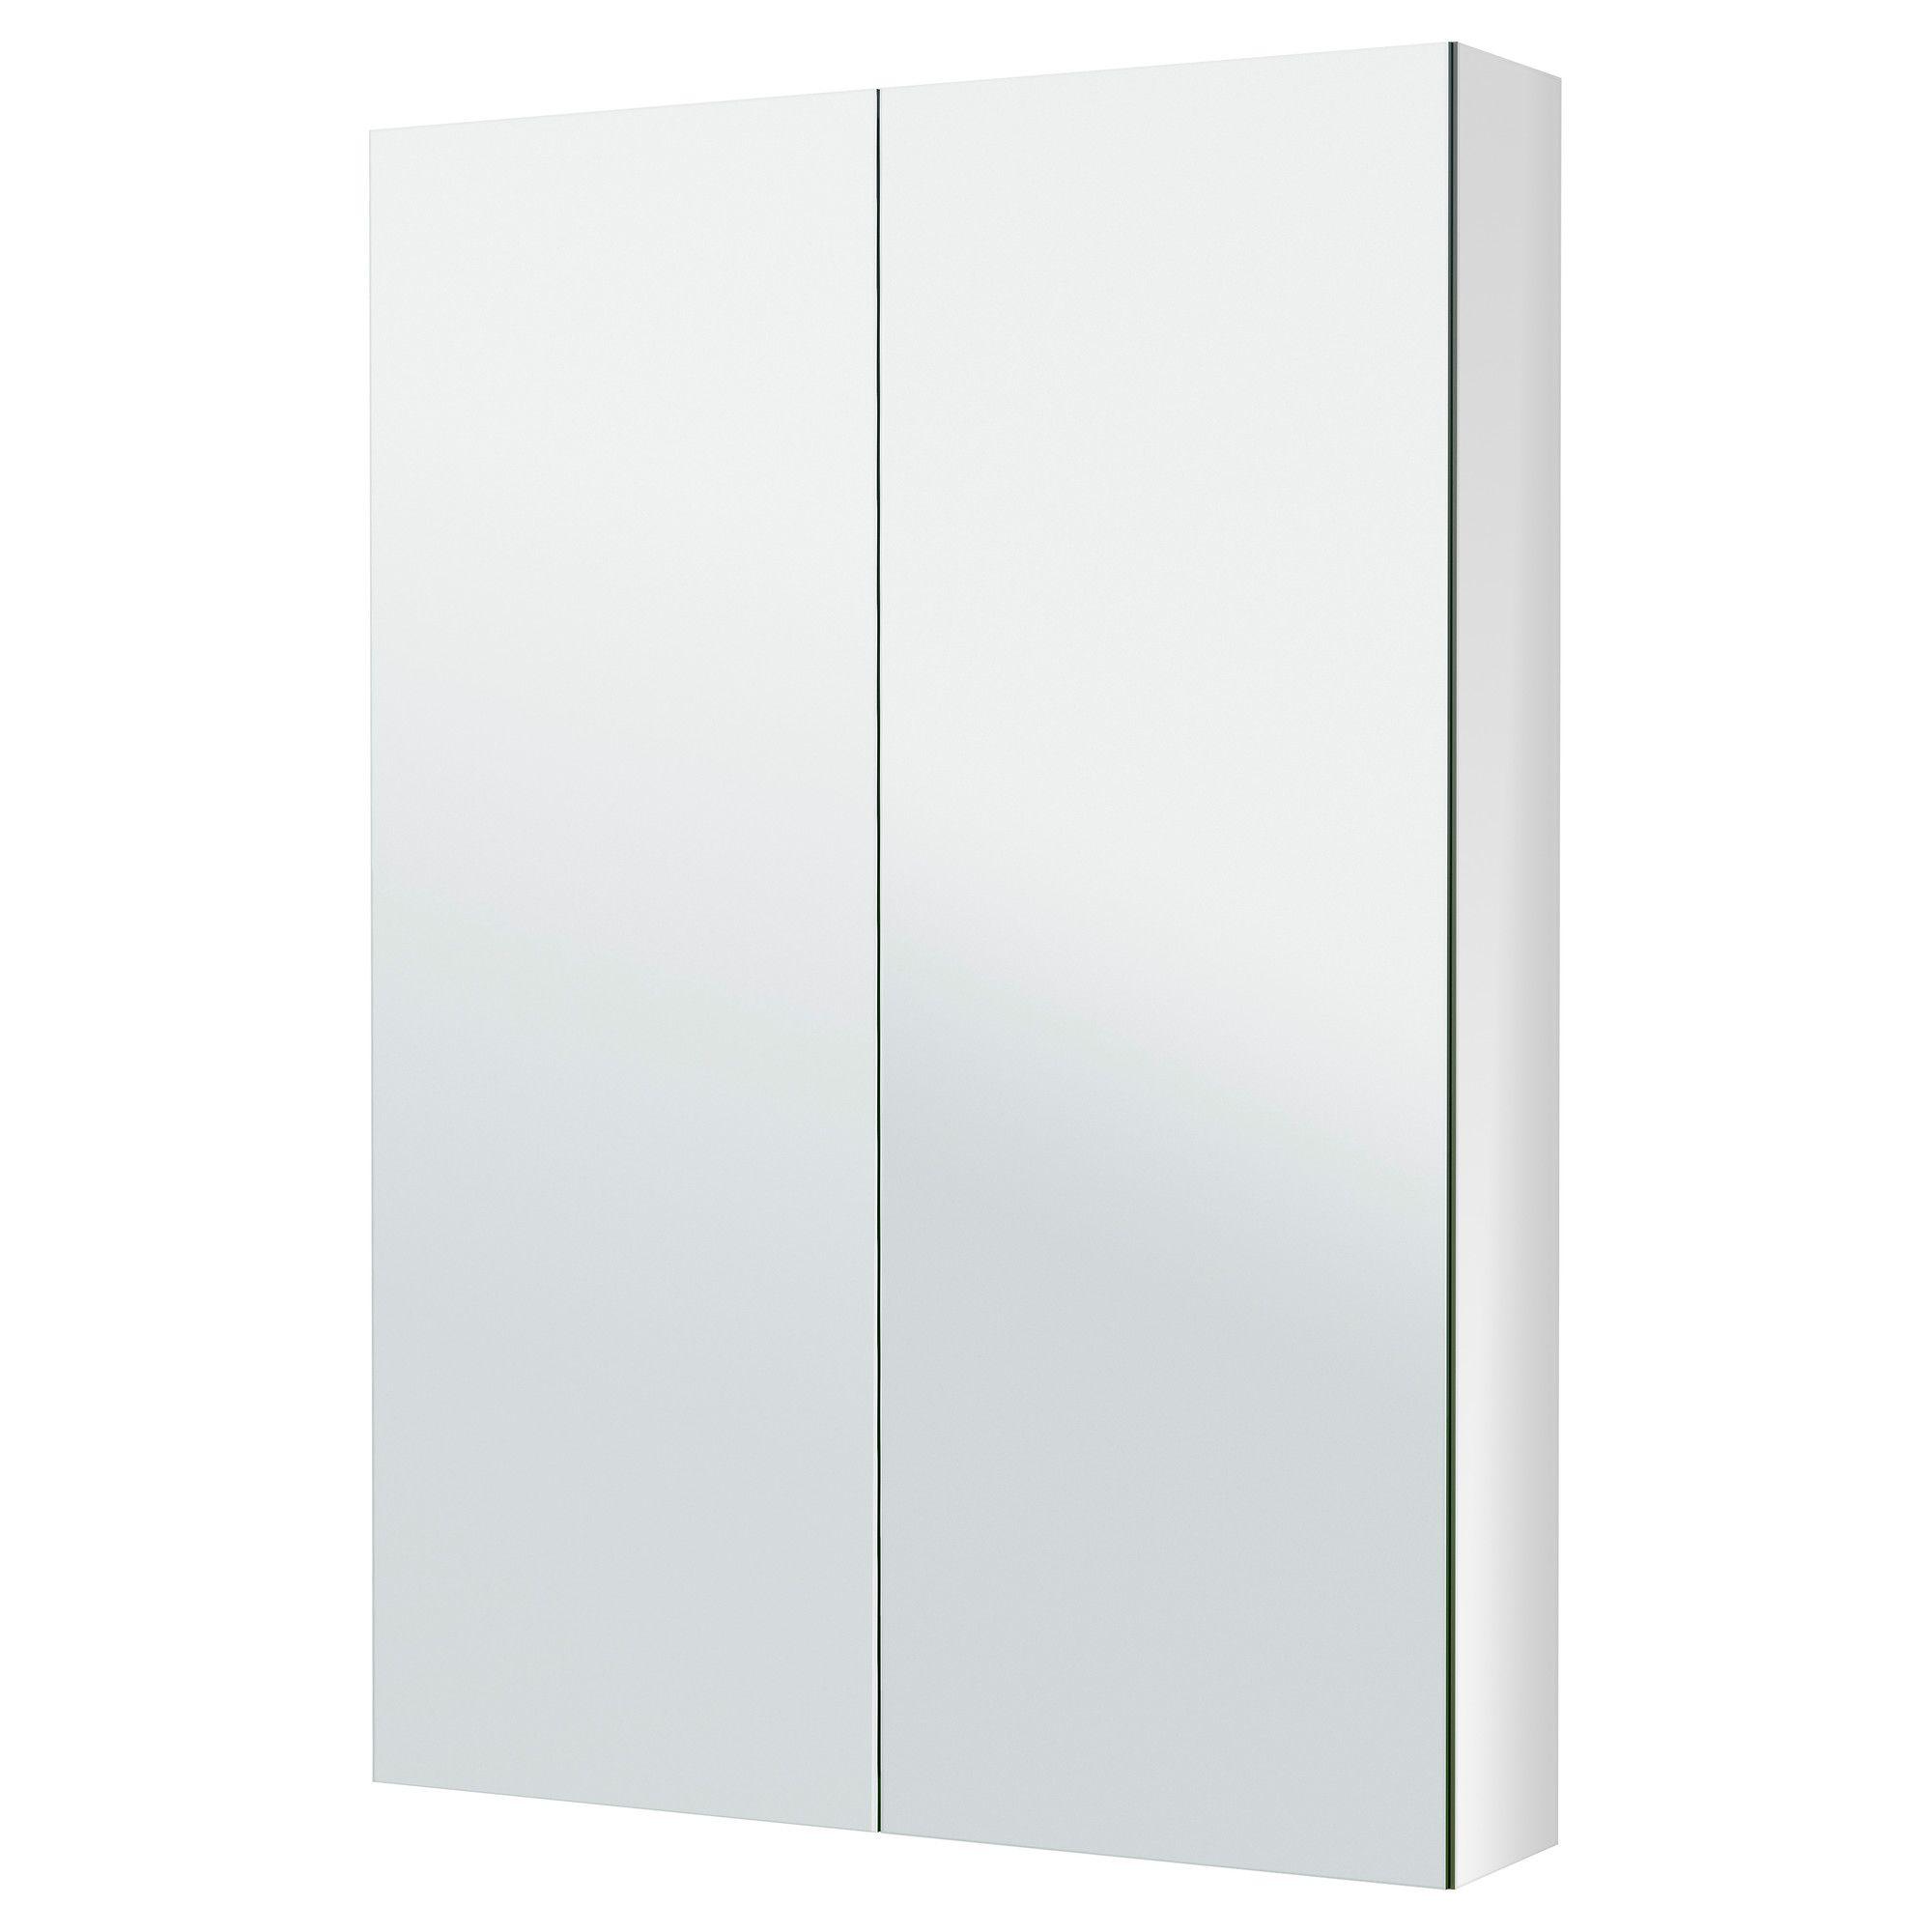 Godmorgon Mirror Cabinet With 2 Doors 23 5 8x5 1 2x37 3 4 Mit